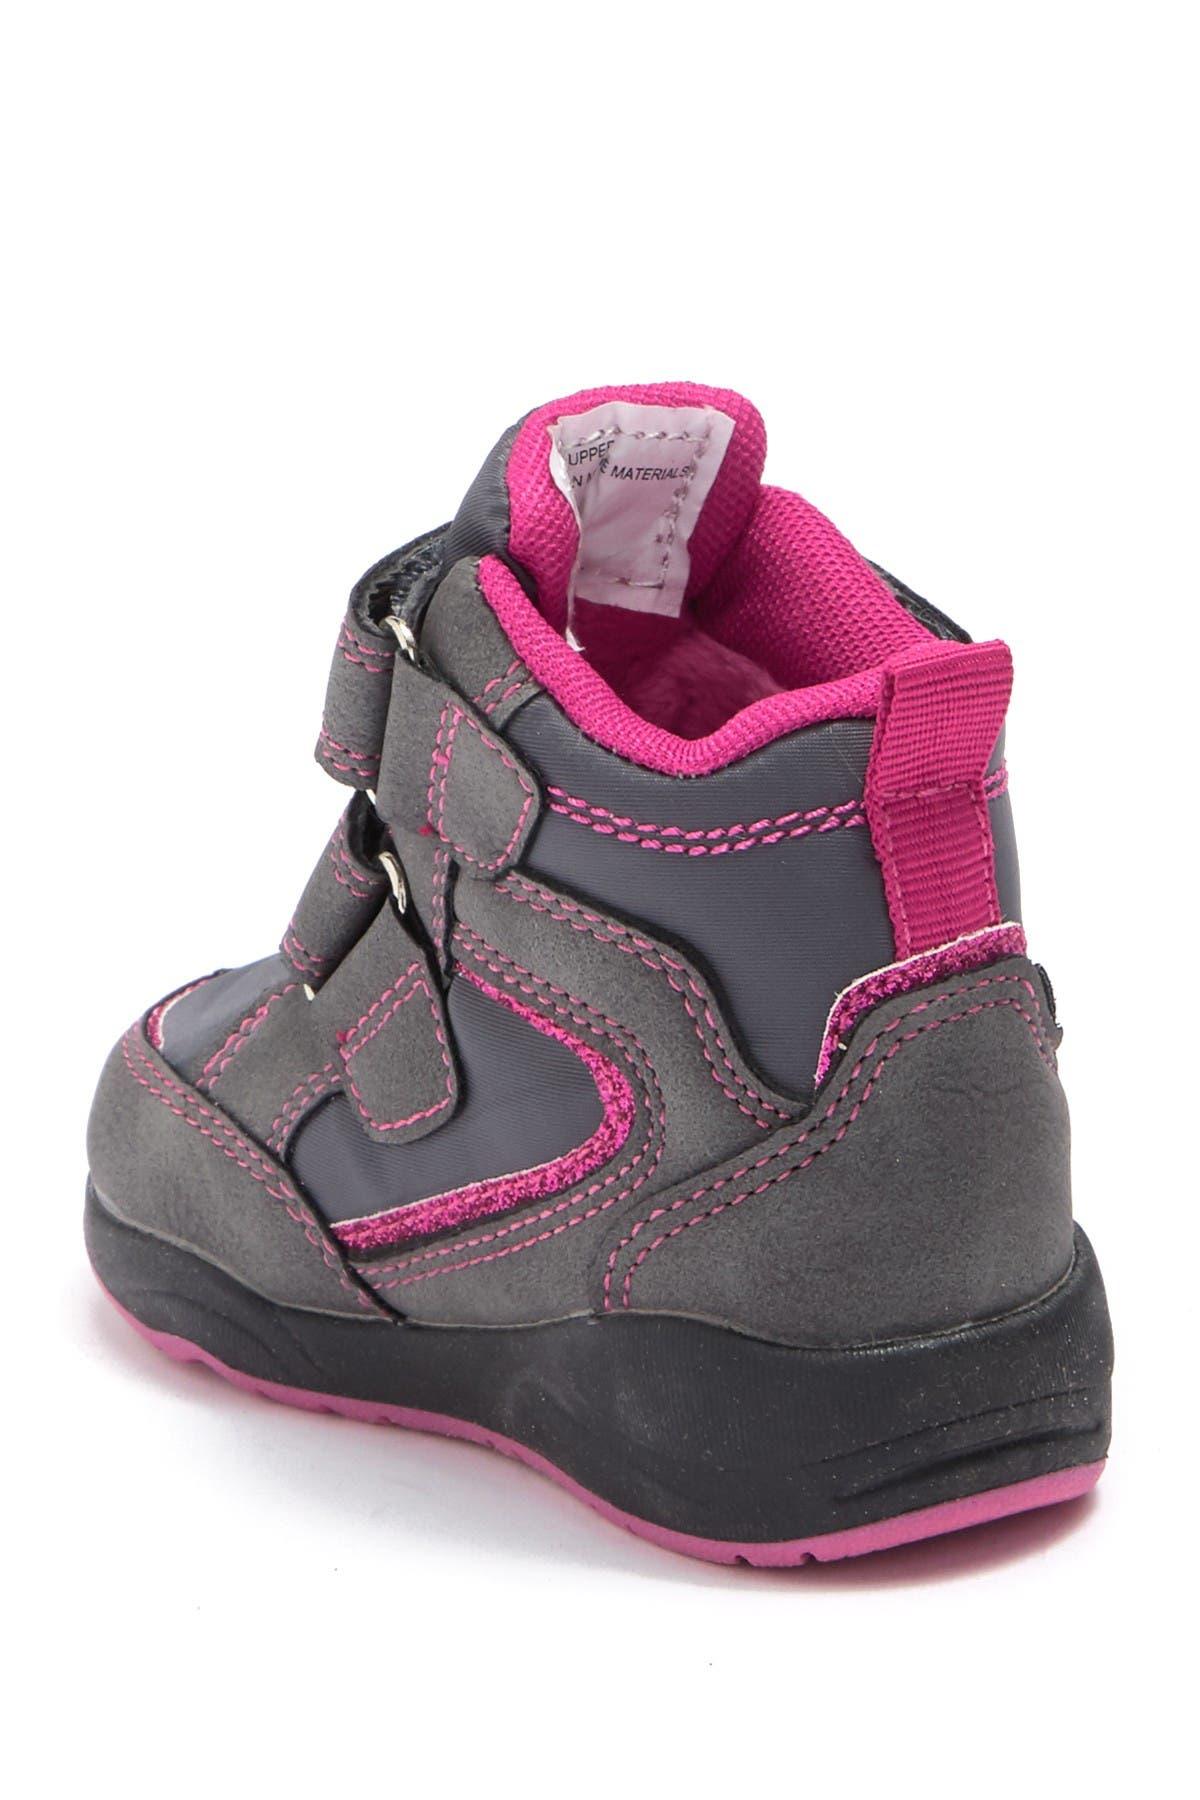 SPROX Snowbunny Boot